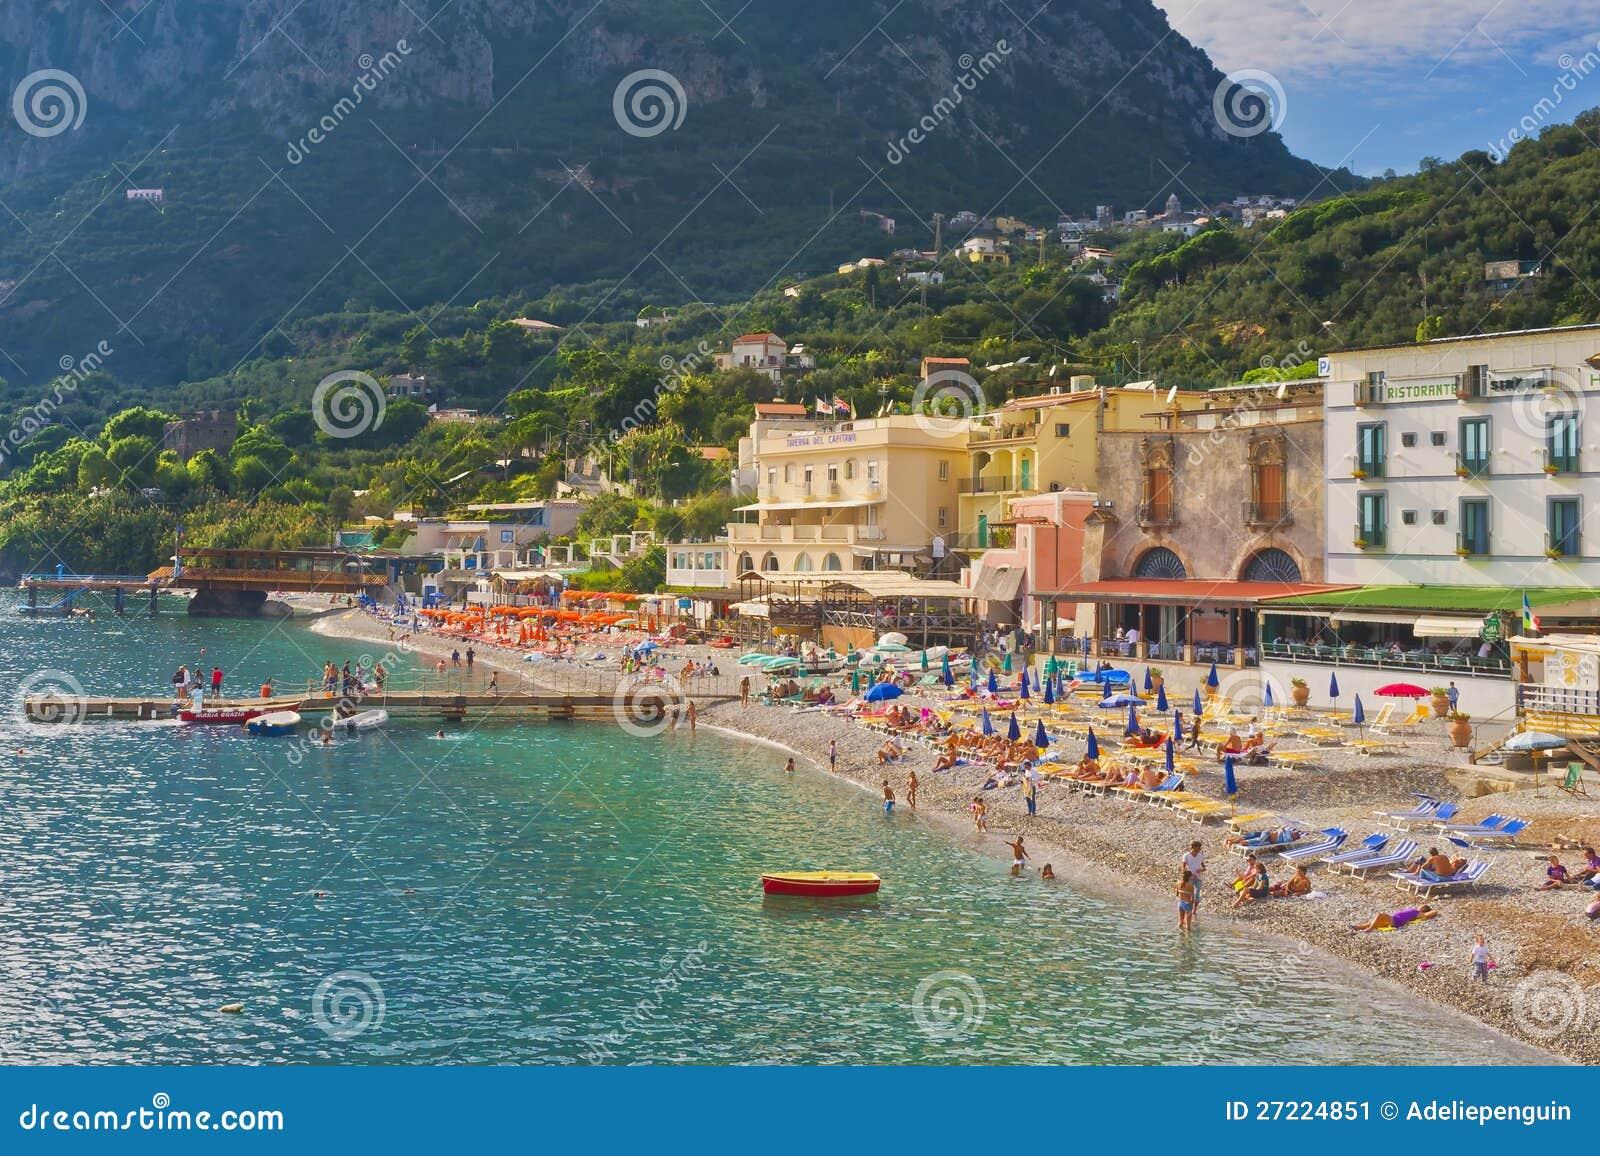 Hotel Plaza Salerno Italy